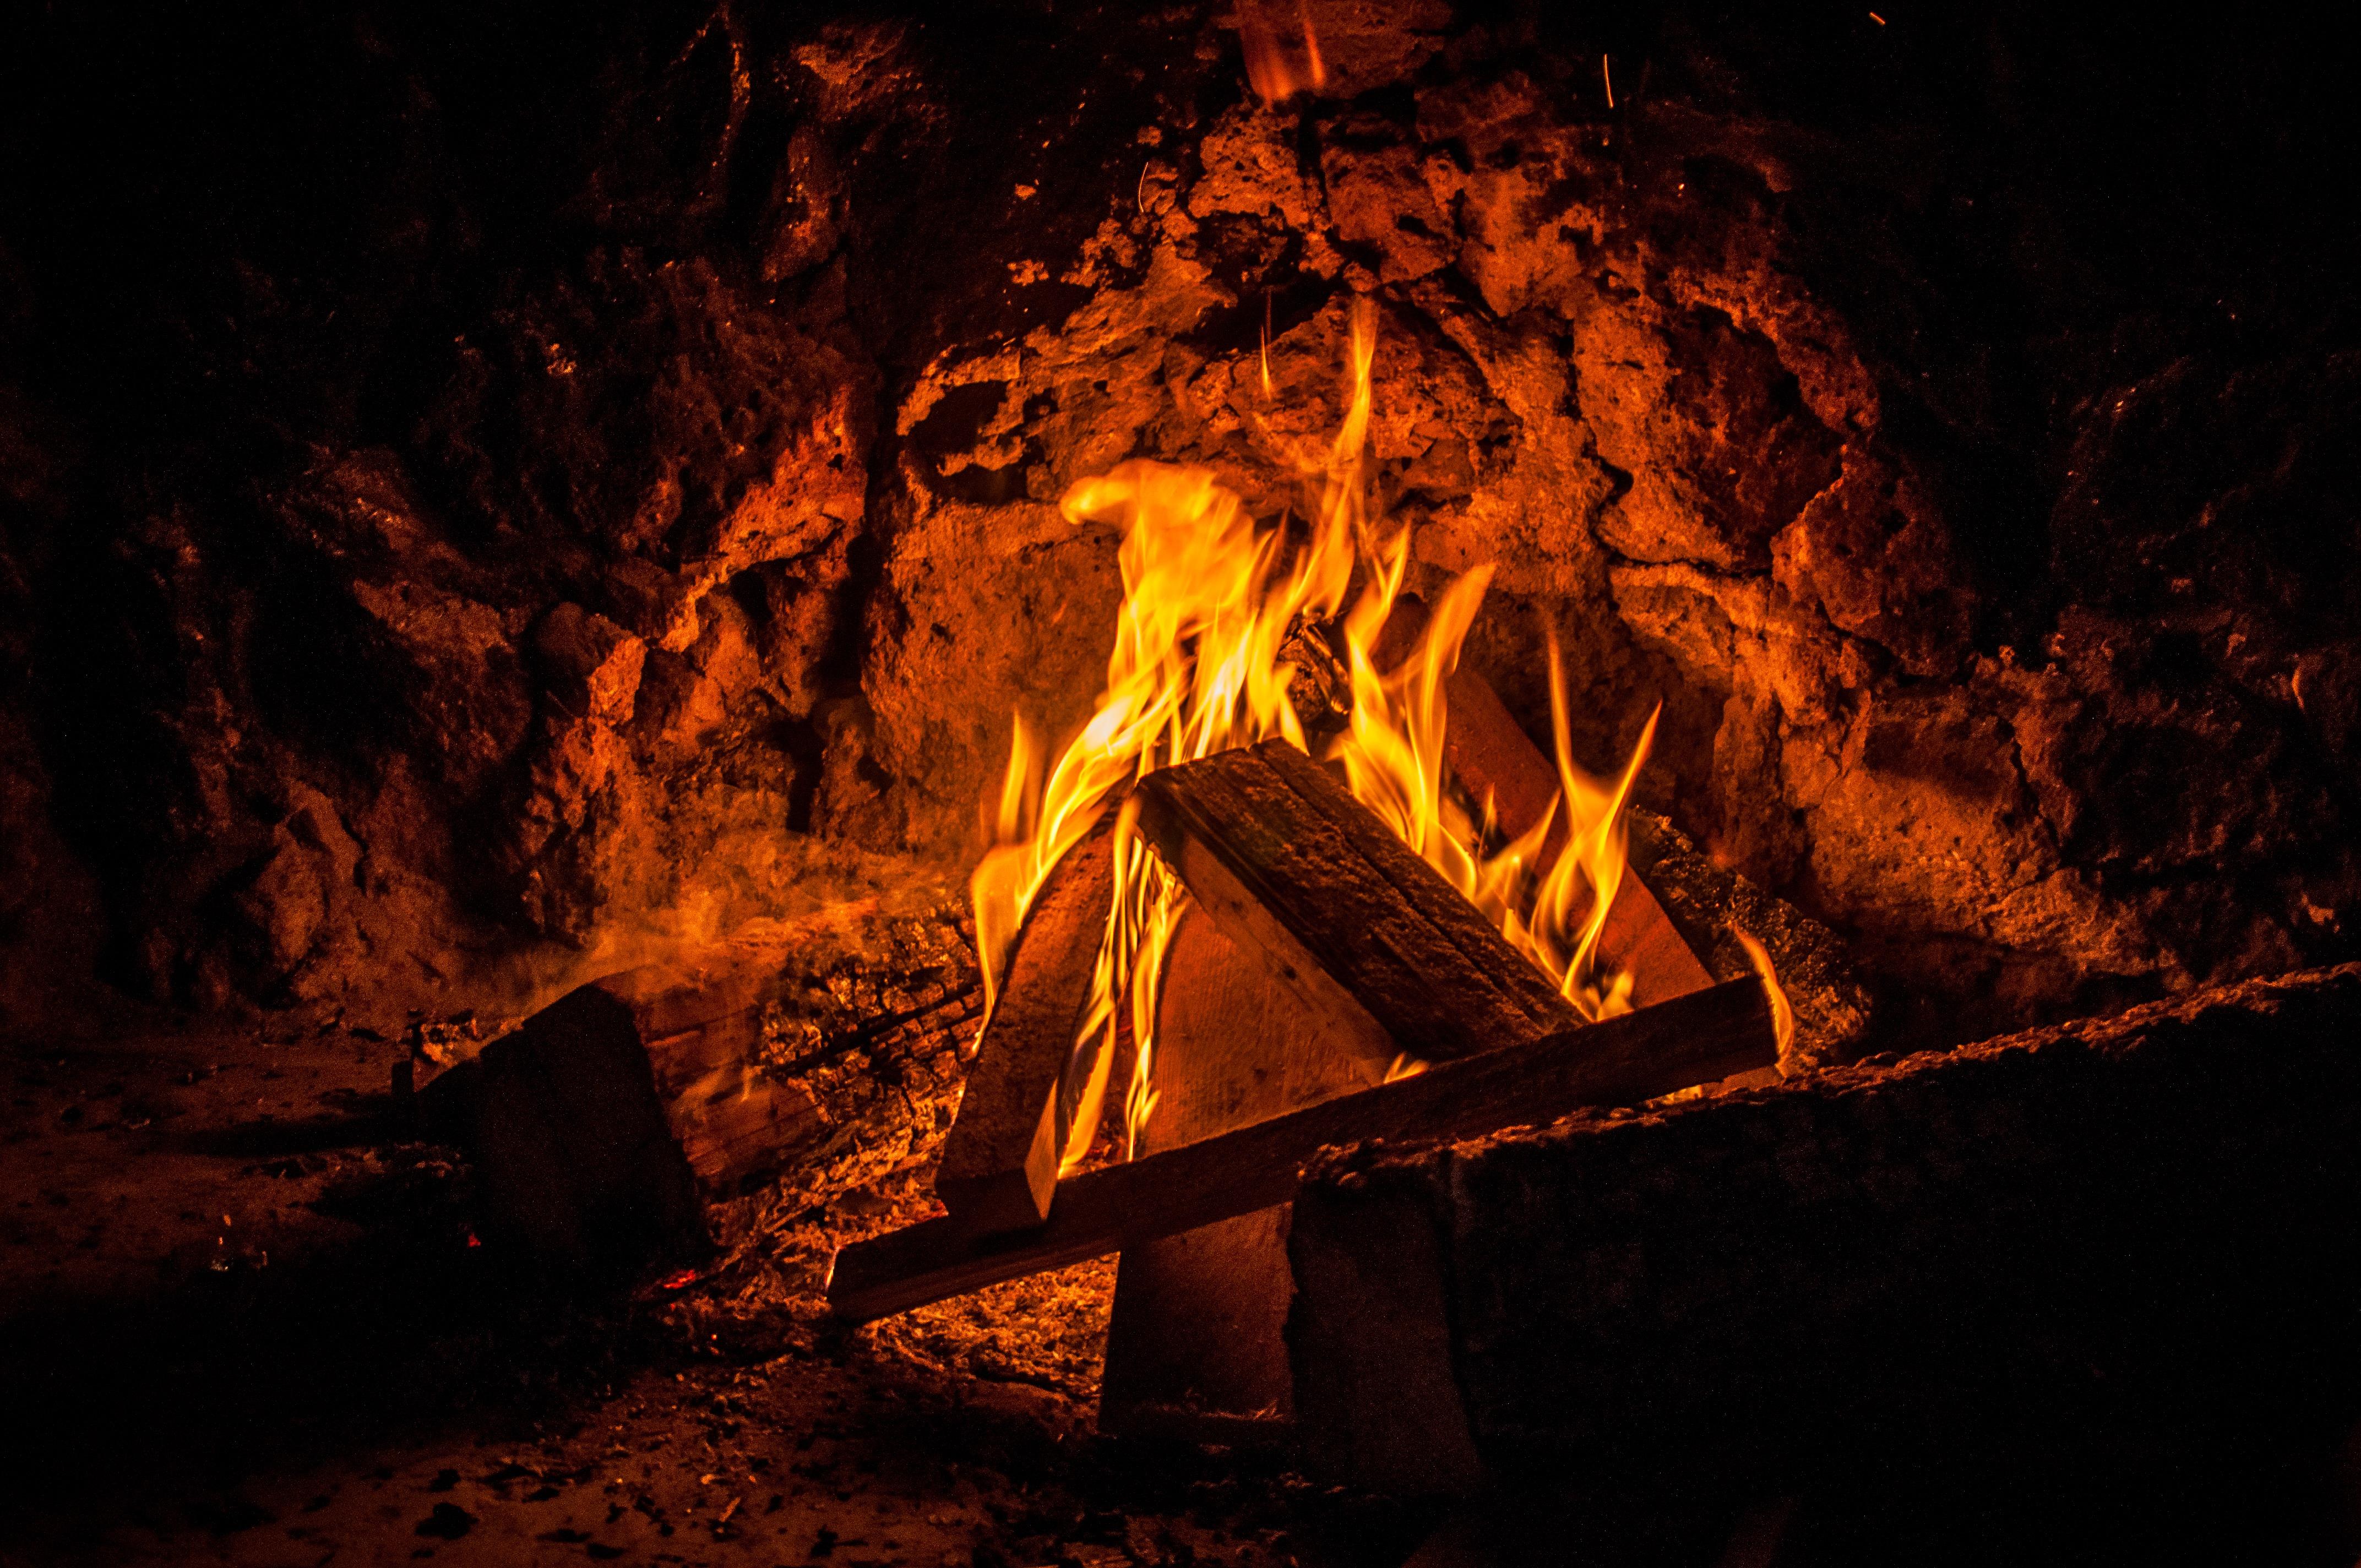 Kostenlose Foto Holz Nacht Bildung Flamme Kamin Dunkelheit